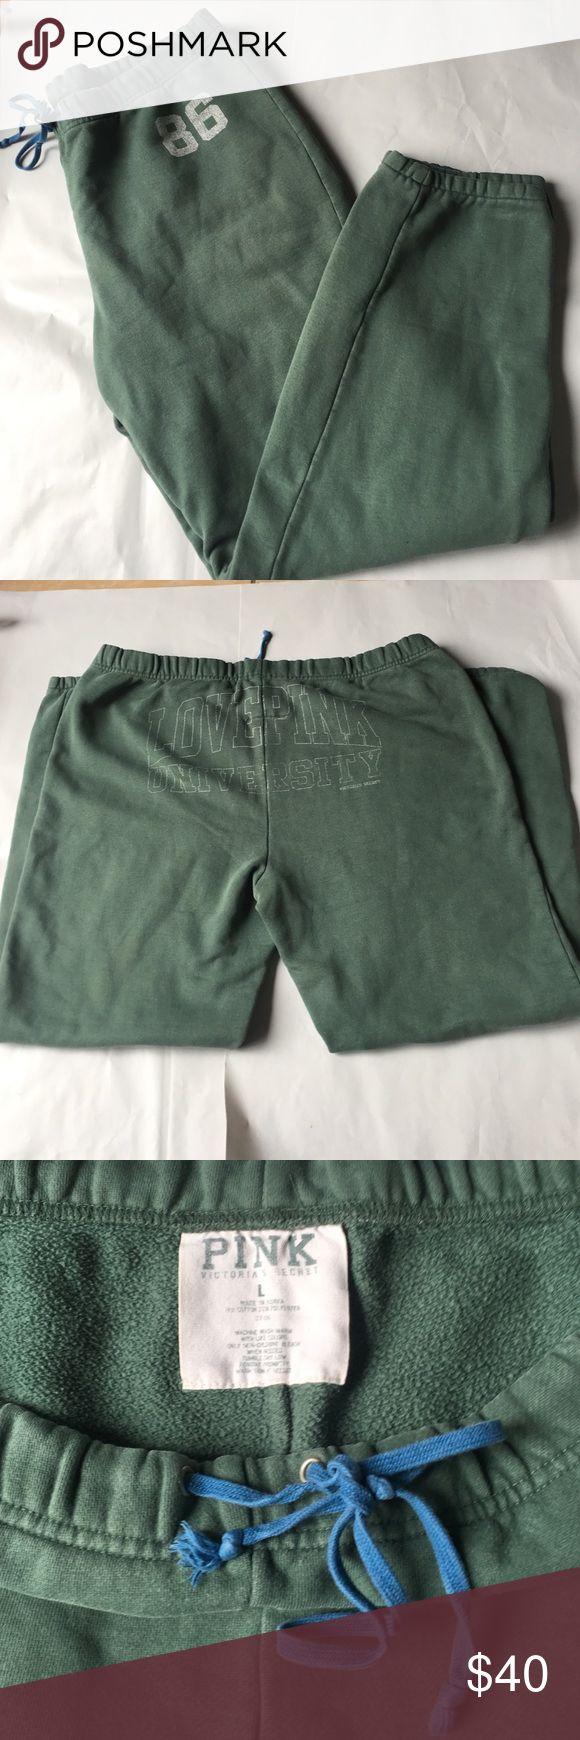 PINK by VICTORIA SECERT green jogger sweatpants Olive green jogger sweats. Size large. PINK Victoria's Secret Intimates & Sleepwear